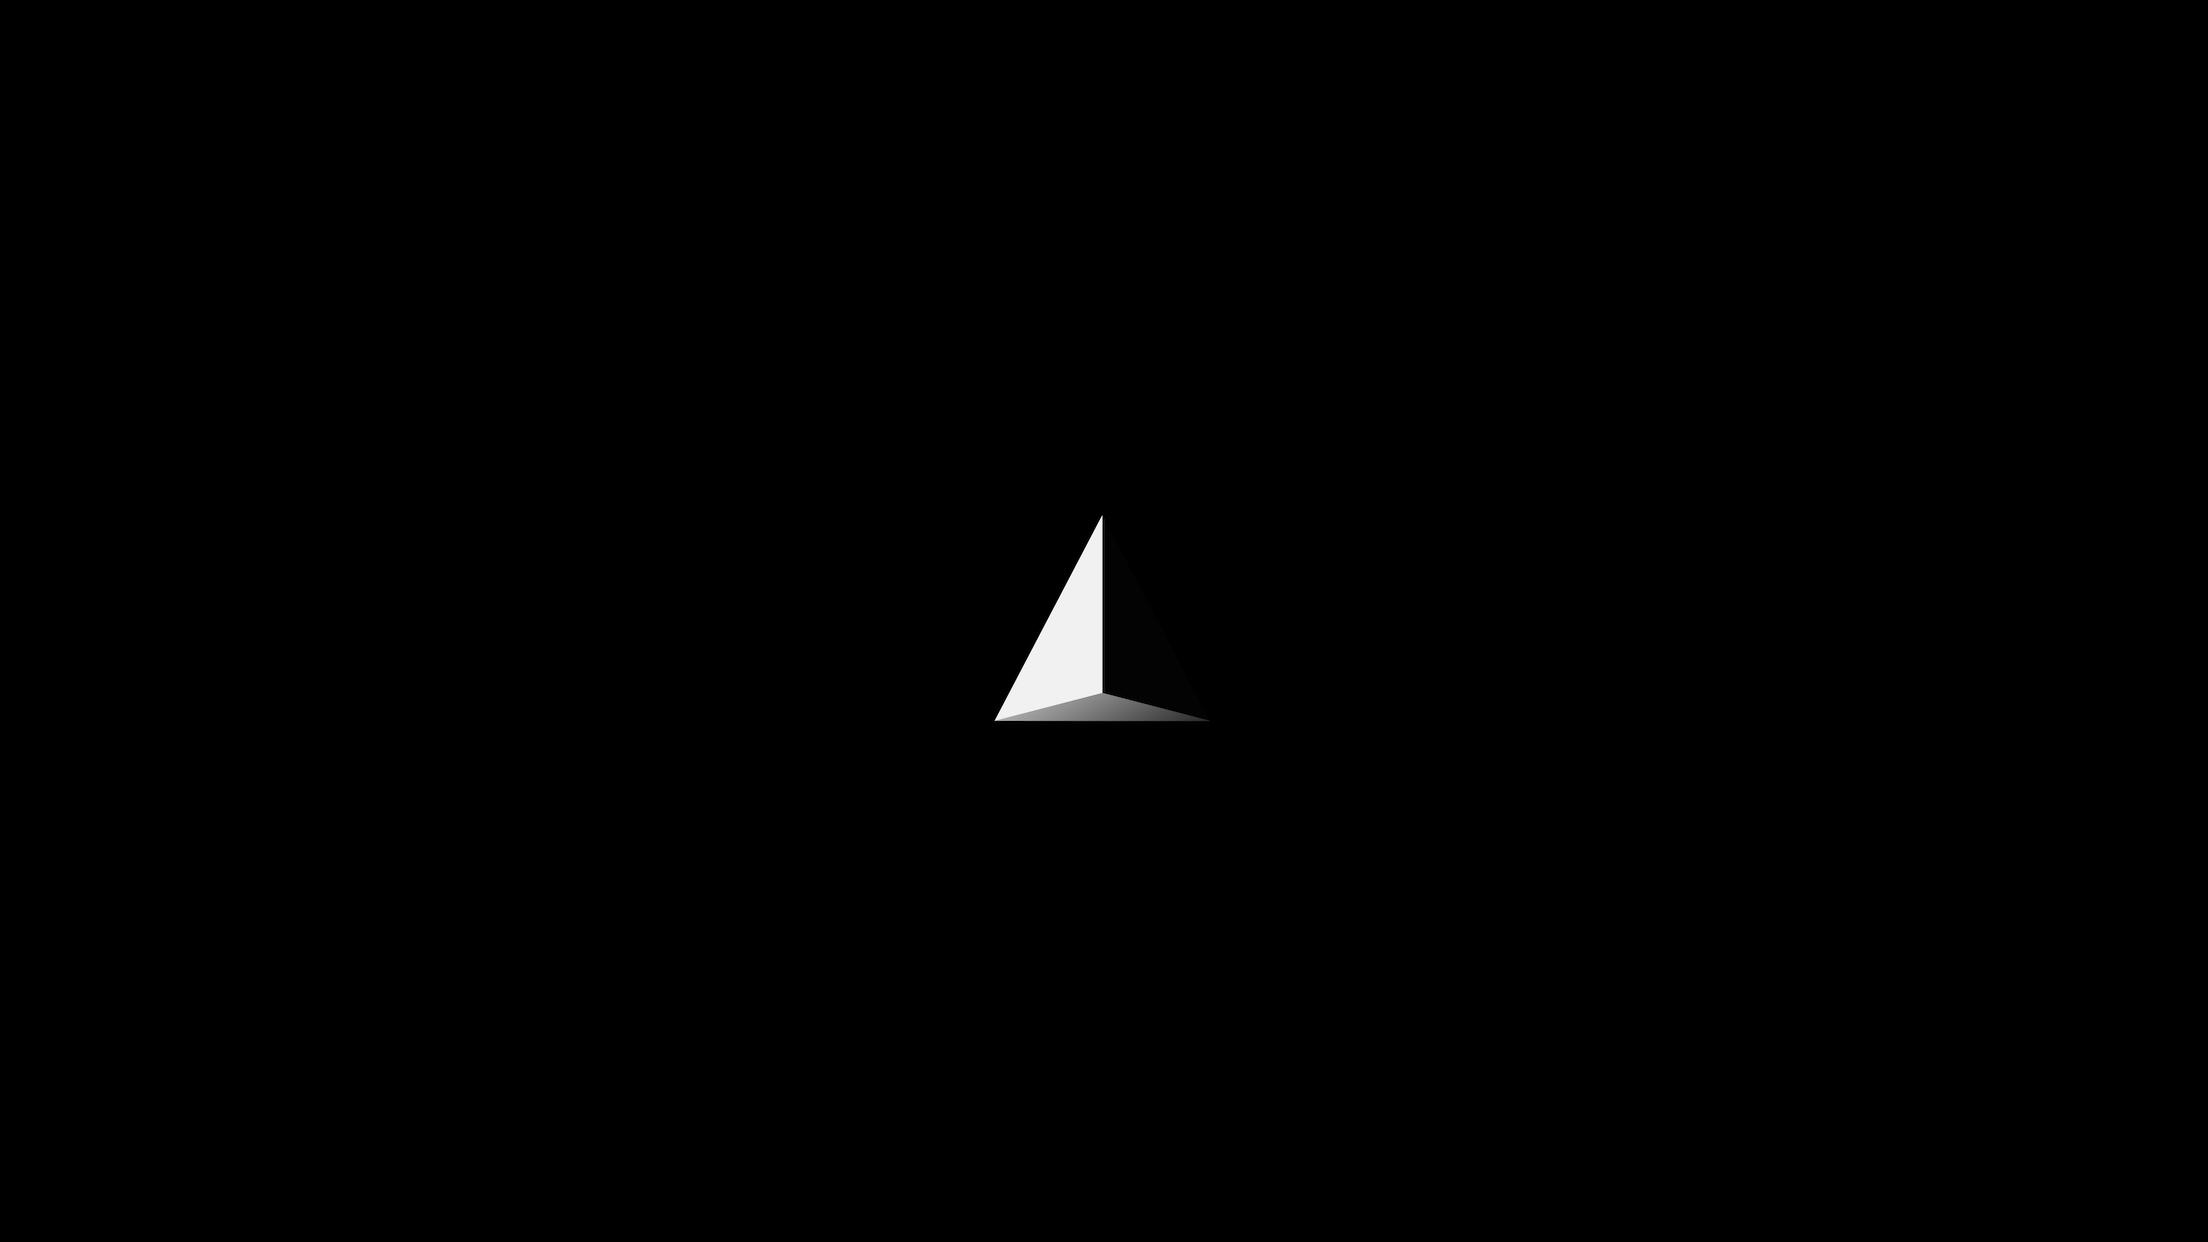 contrib/mobile/iOS/Onelab/Images.xcassets/LaunchImage.launchimage/splash2208x1242.png